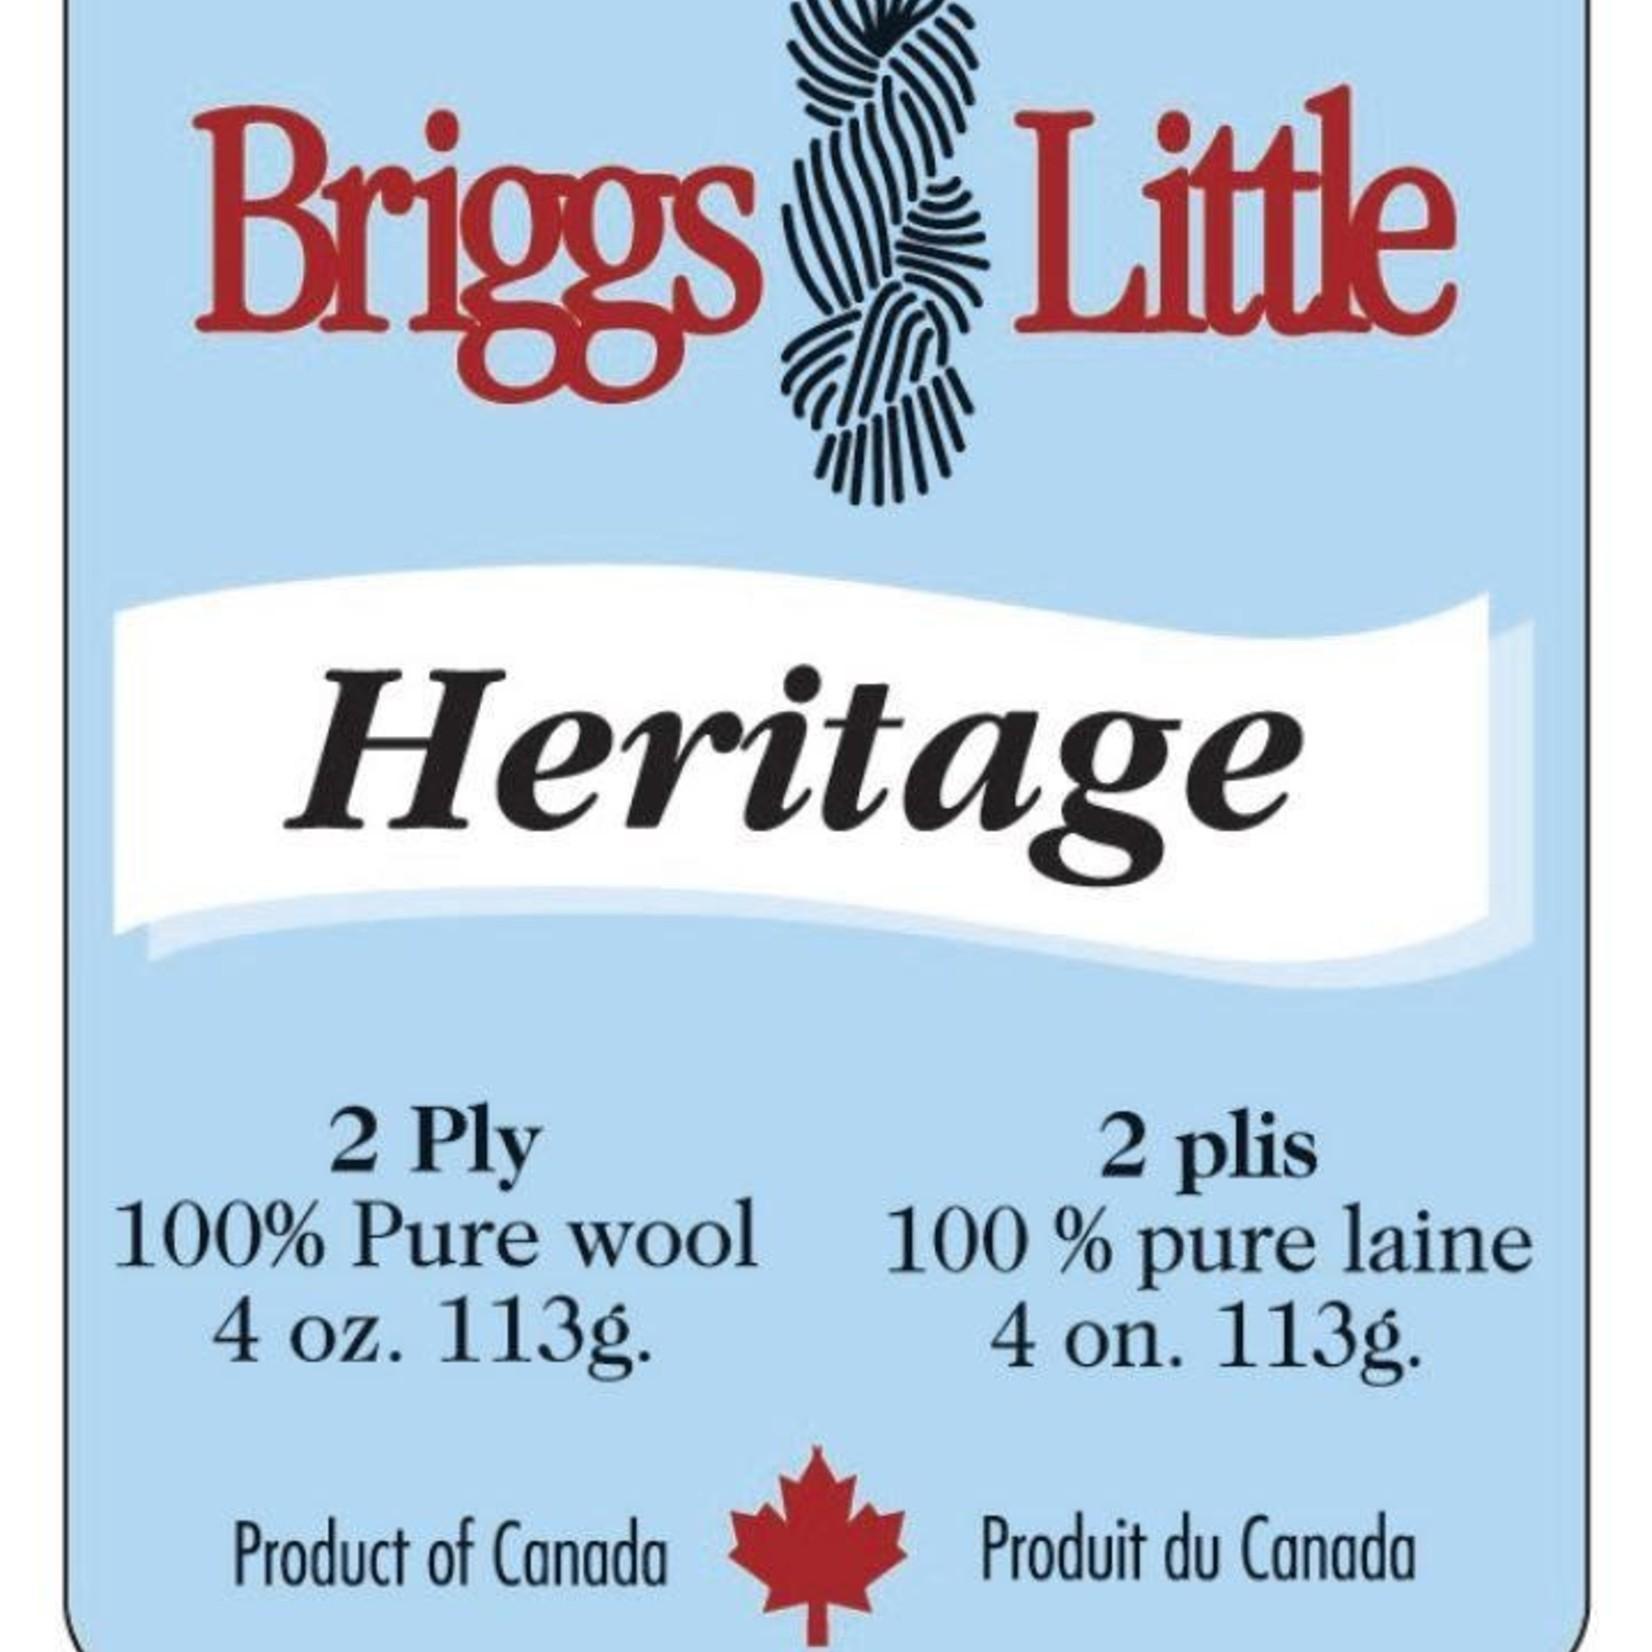 Briggs & Little Heritage Yarn by Briggs & Little